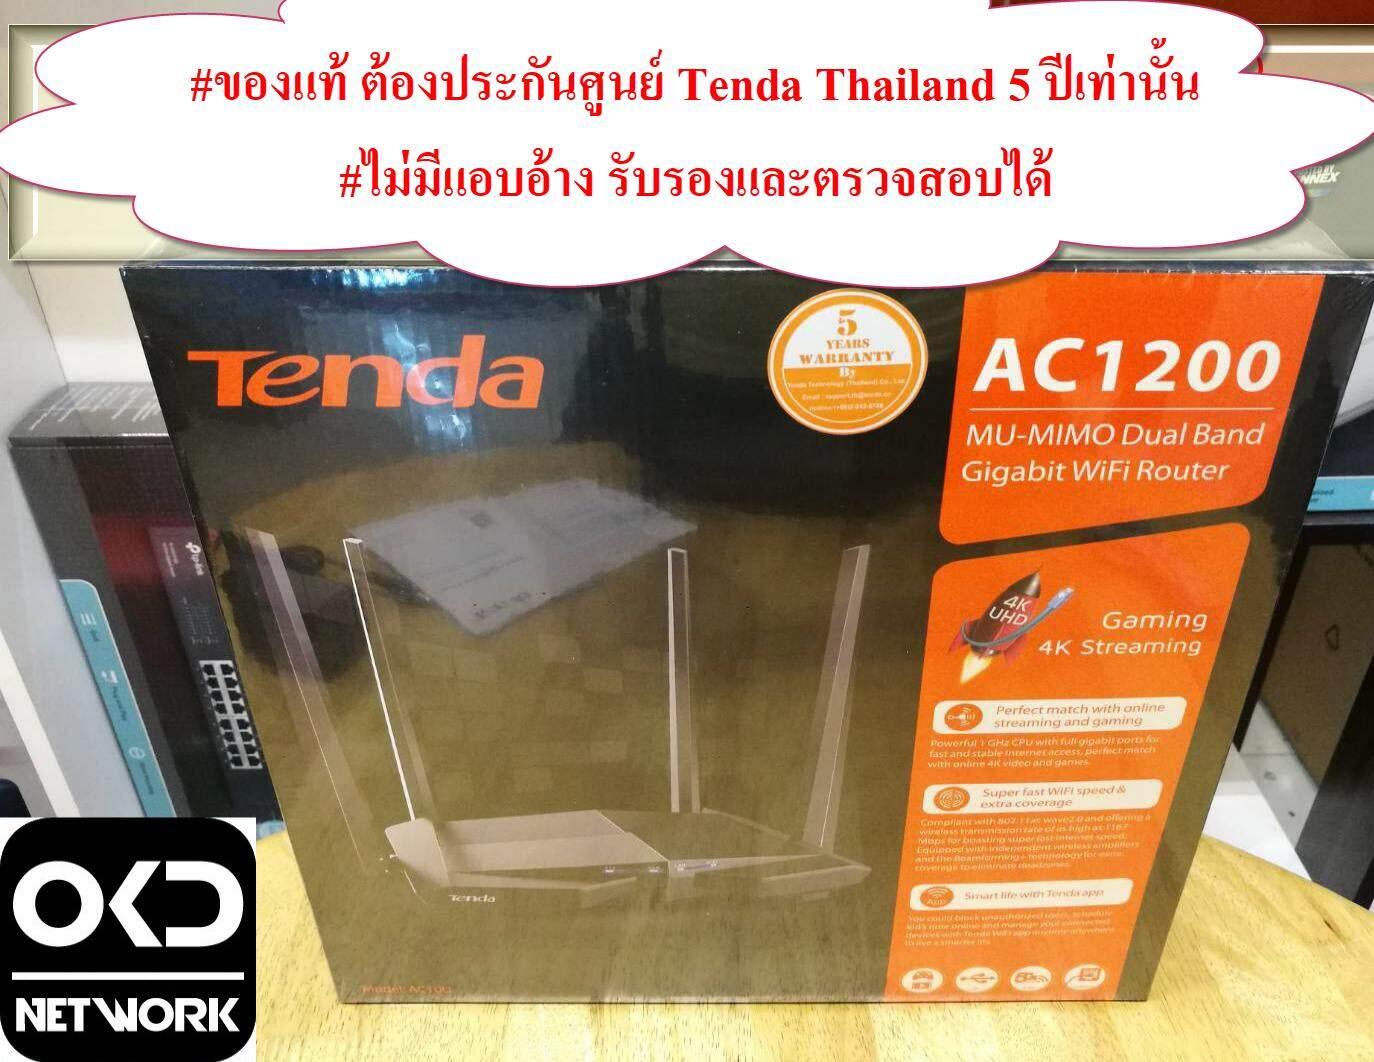 Tenda Network Components Modem Router 11n Wifi Adsl2 Dh301 4port Switch In One Device Ac10u Wireless Gigabit Ac1200 Mu Mimo Usb